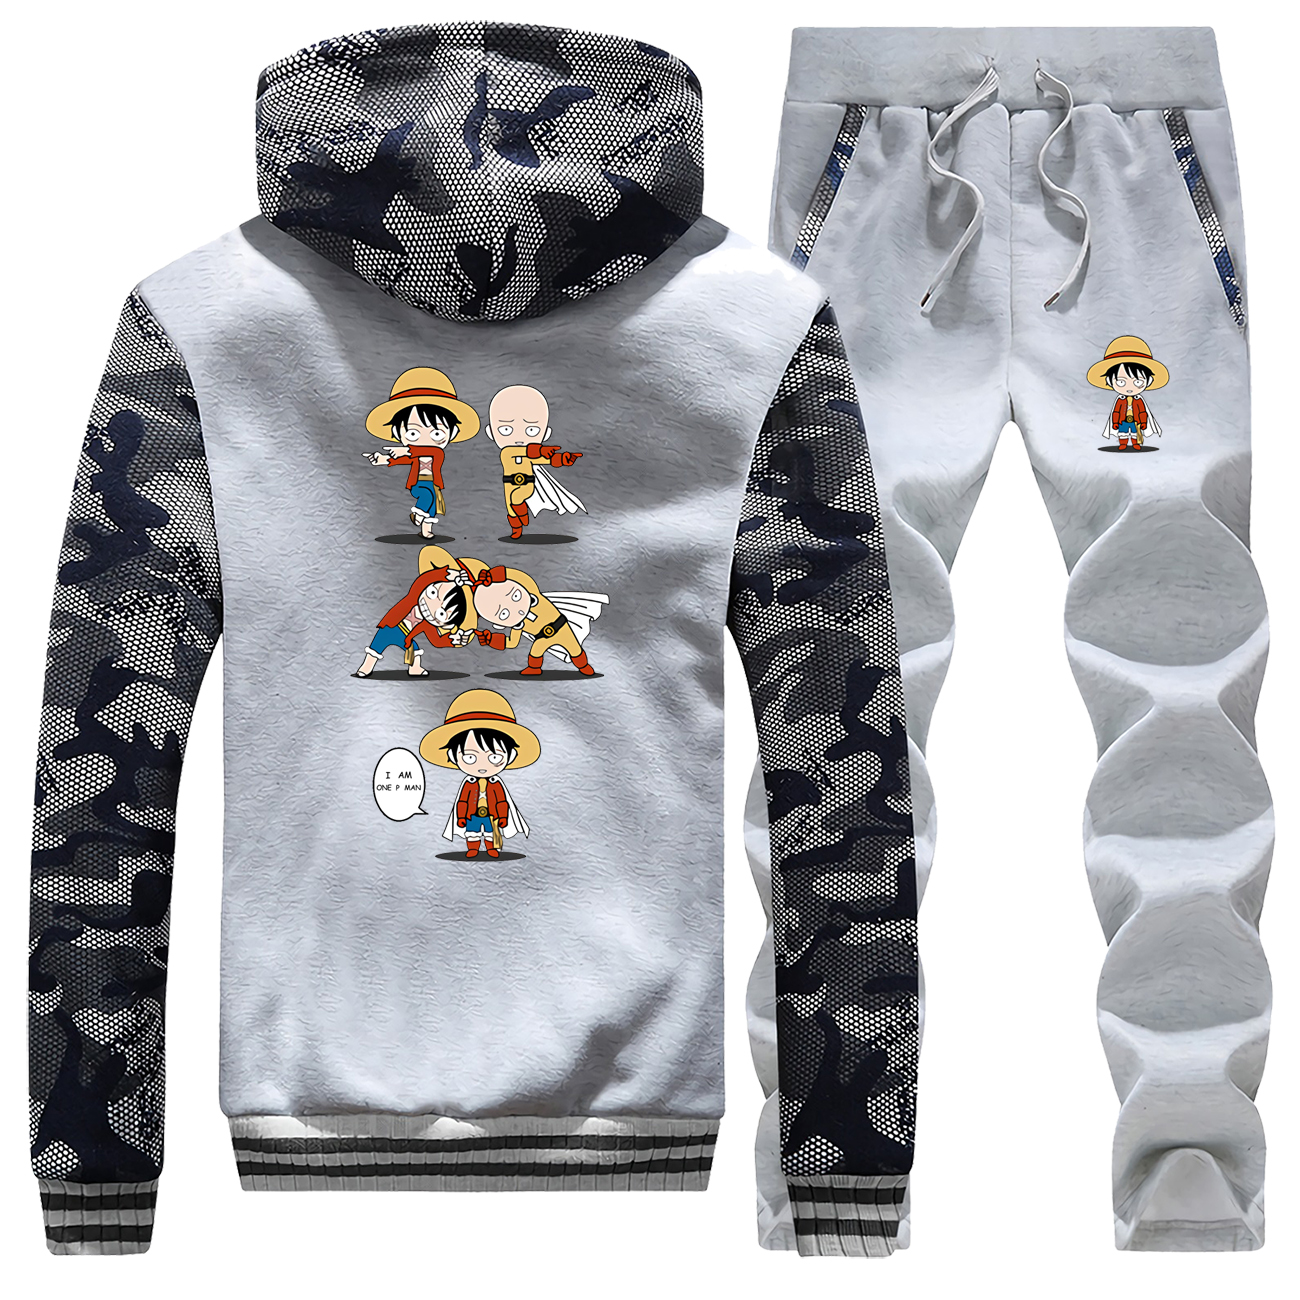 One Punch Man Saitama Tracksuits Jacket Pant Set Men One Piece Luffy Sportsuits Hoodie Sweatpant Sets Suit 2 PCS Coat Sportswear